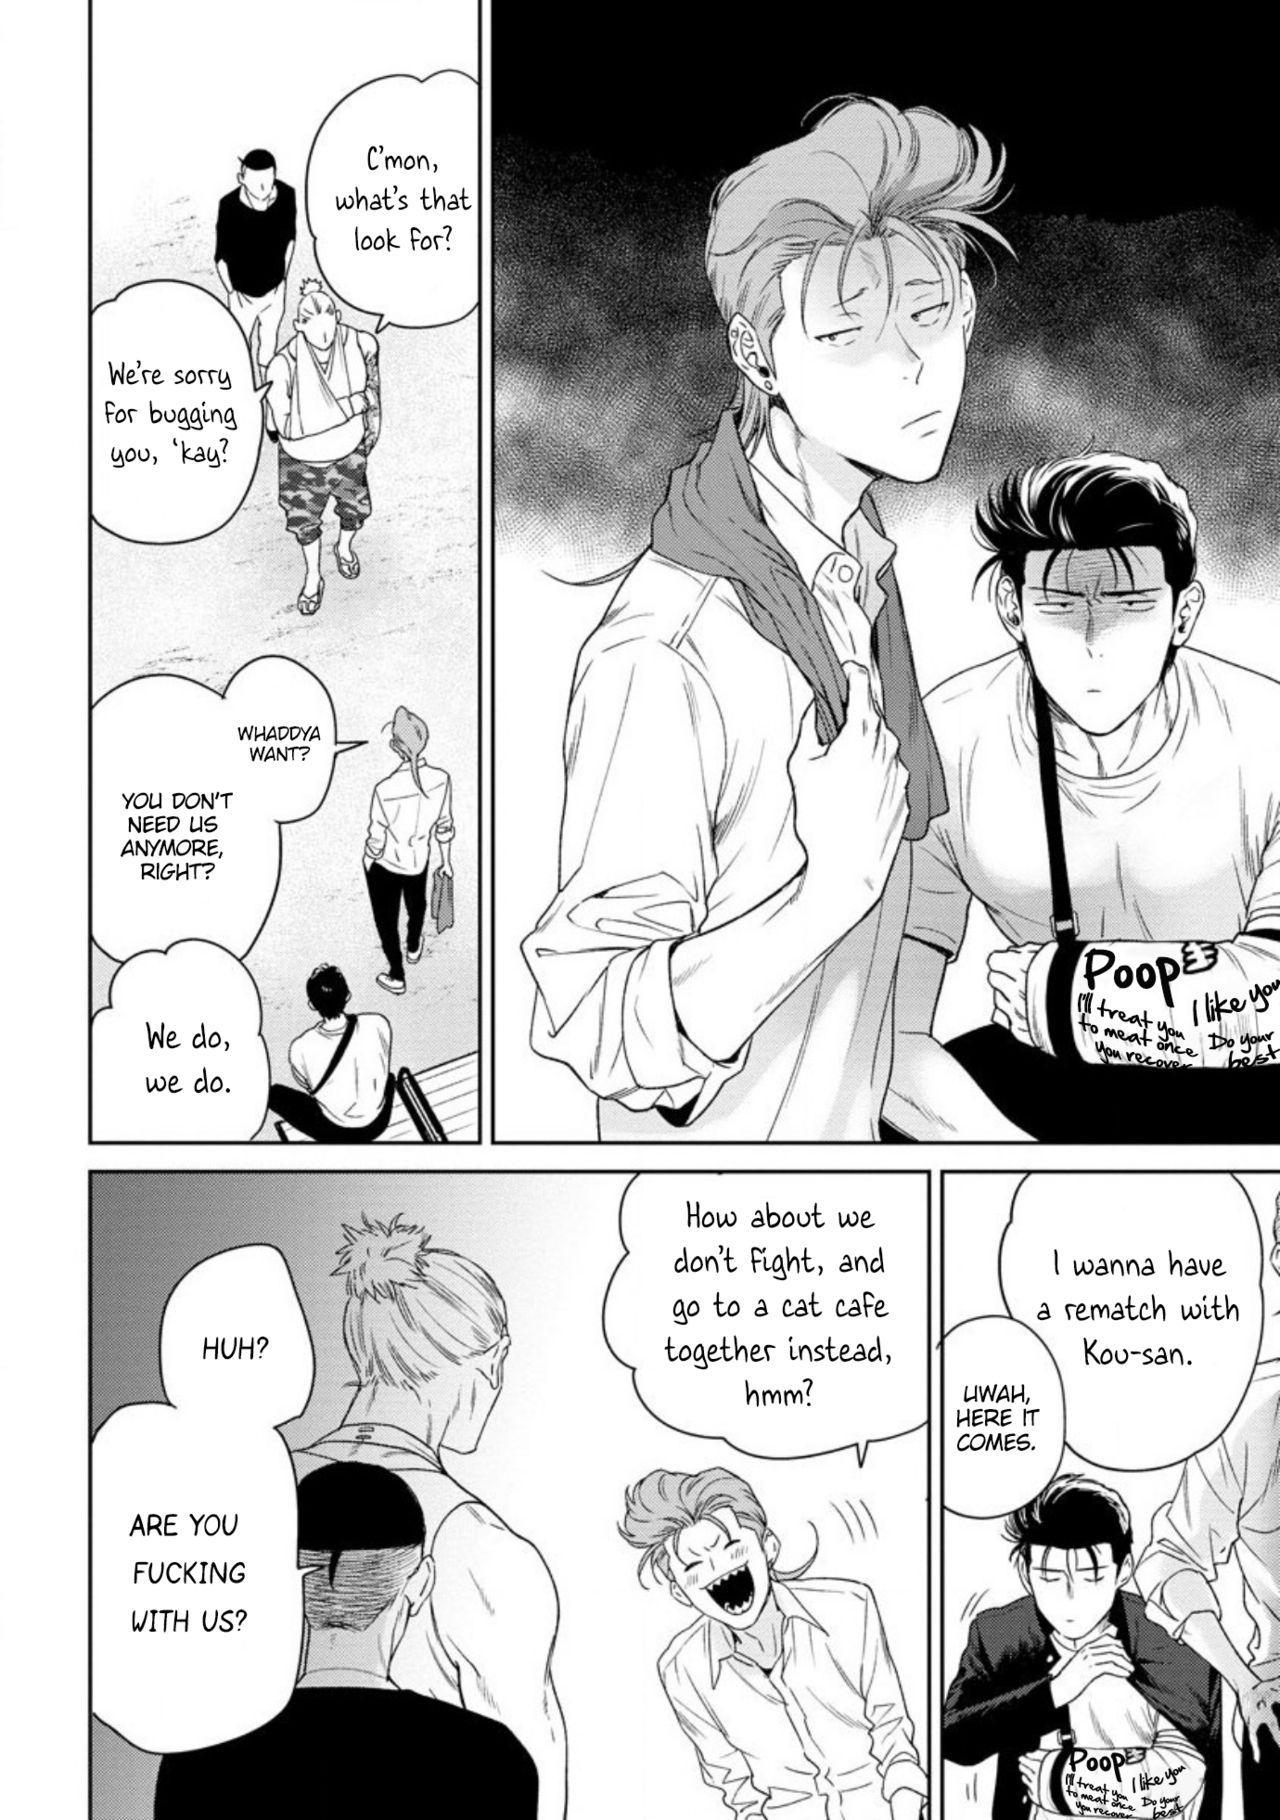 [Hiiragi Nozomu] Nakasete Yaru yo Yankee-kun   I'll Make You Cry Ch. 1-5 + Extras [English] [Digital] 158